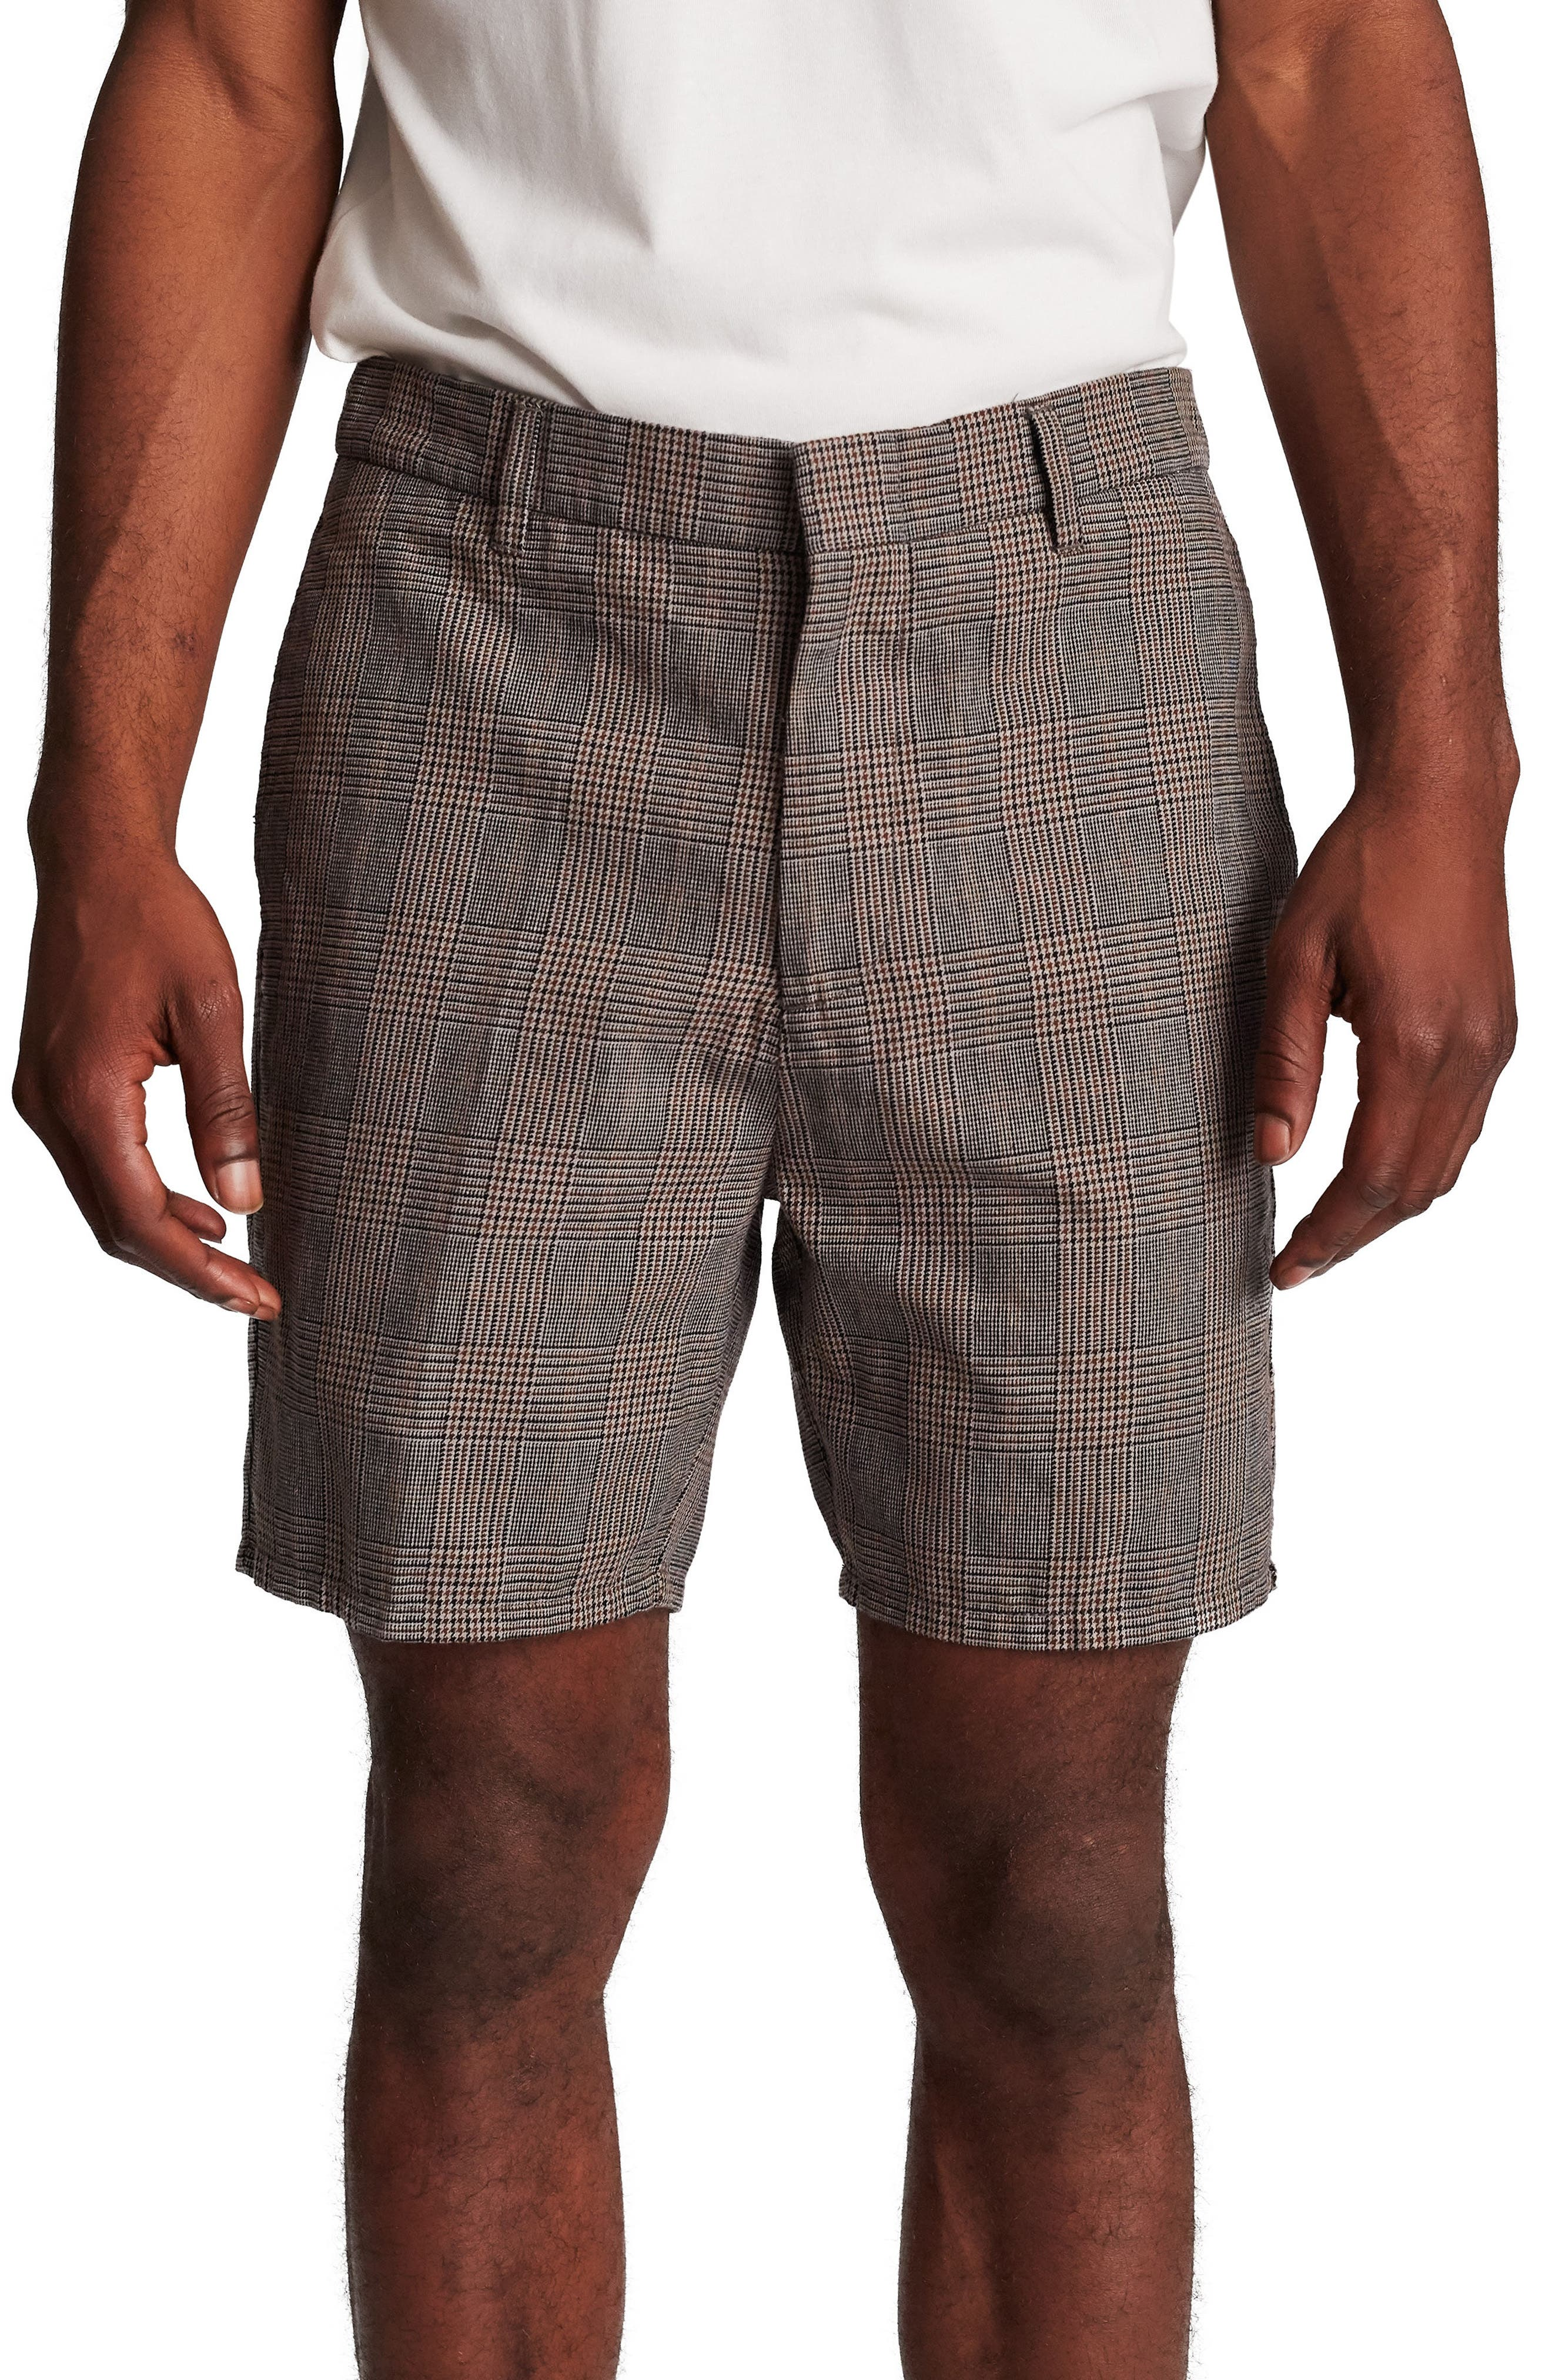 Graduate Slack Shorts,                             Main thumbnail 1, color,                             GREY PLAID